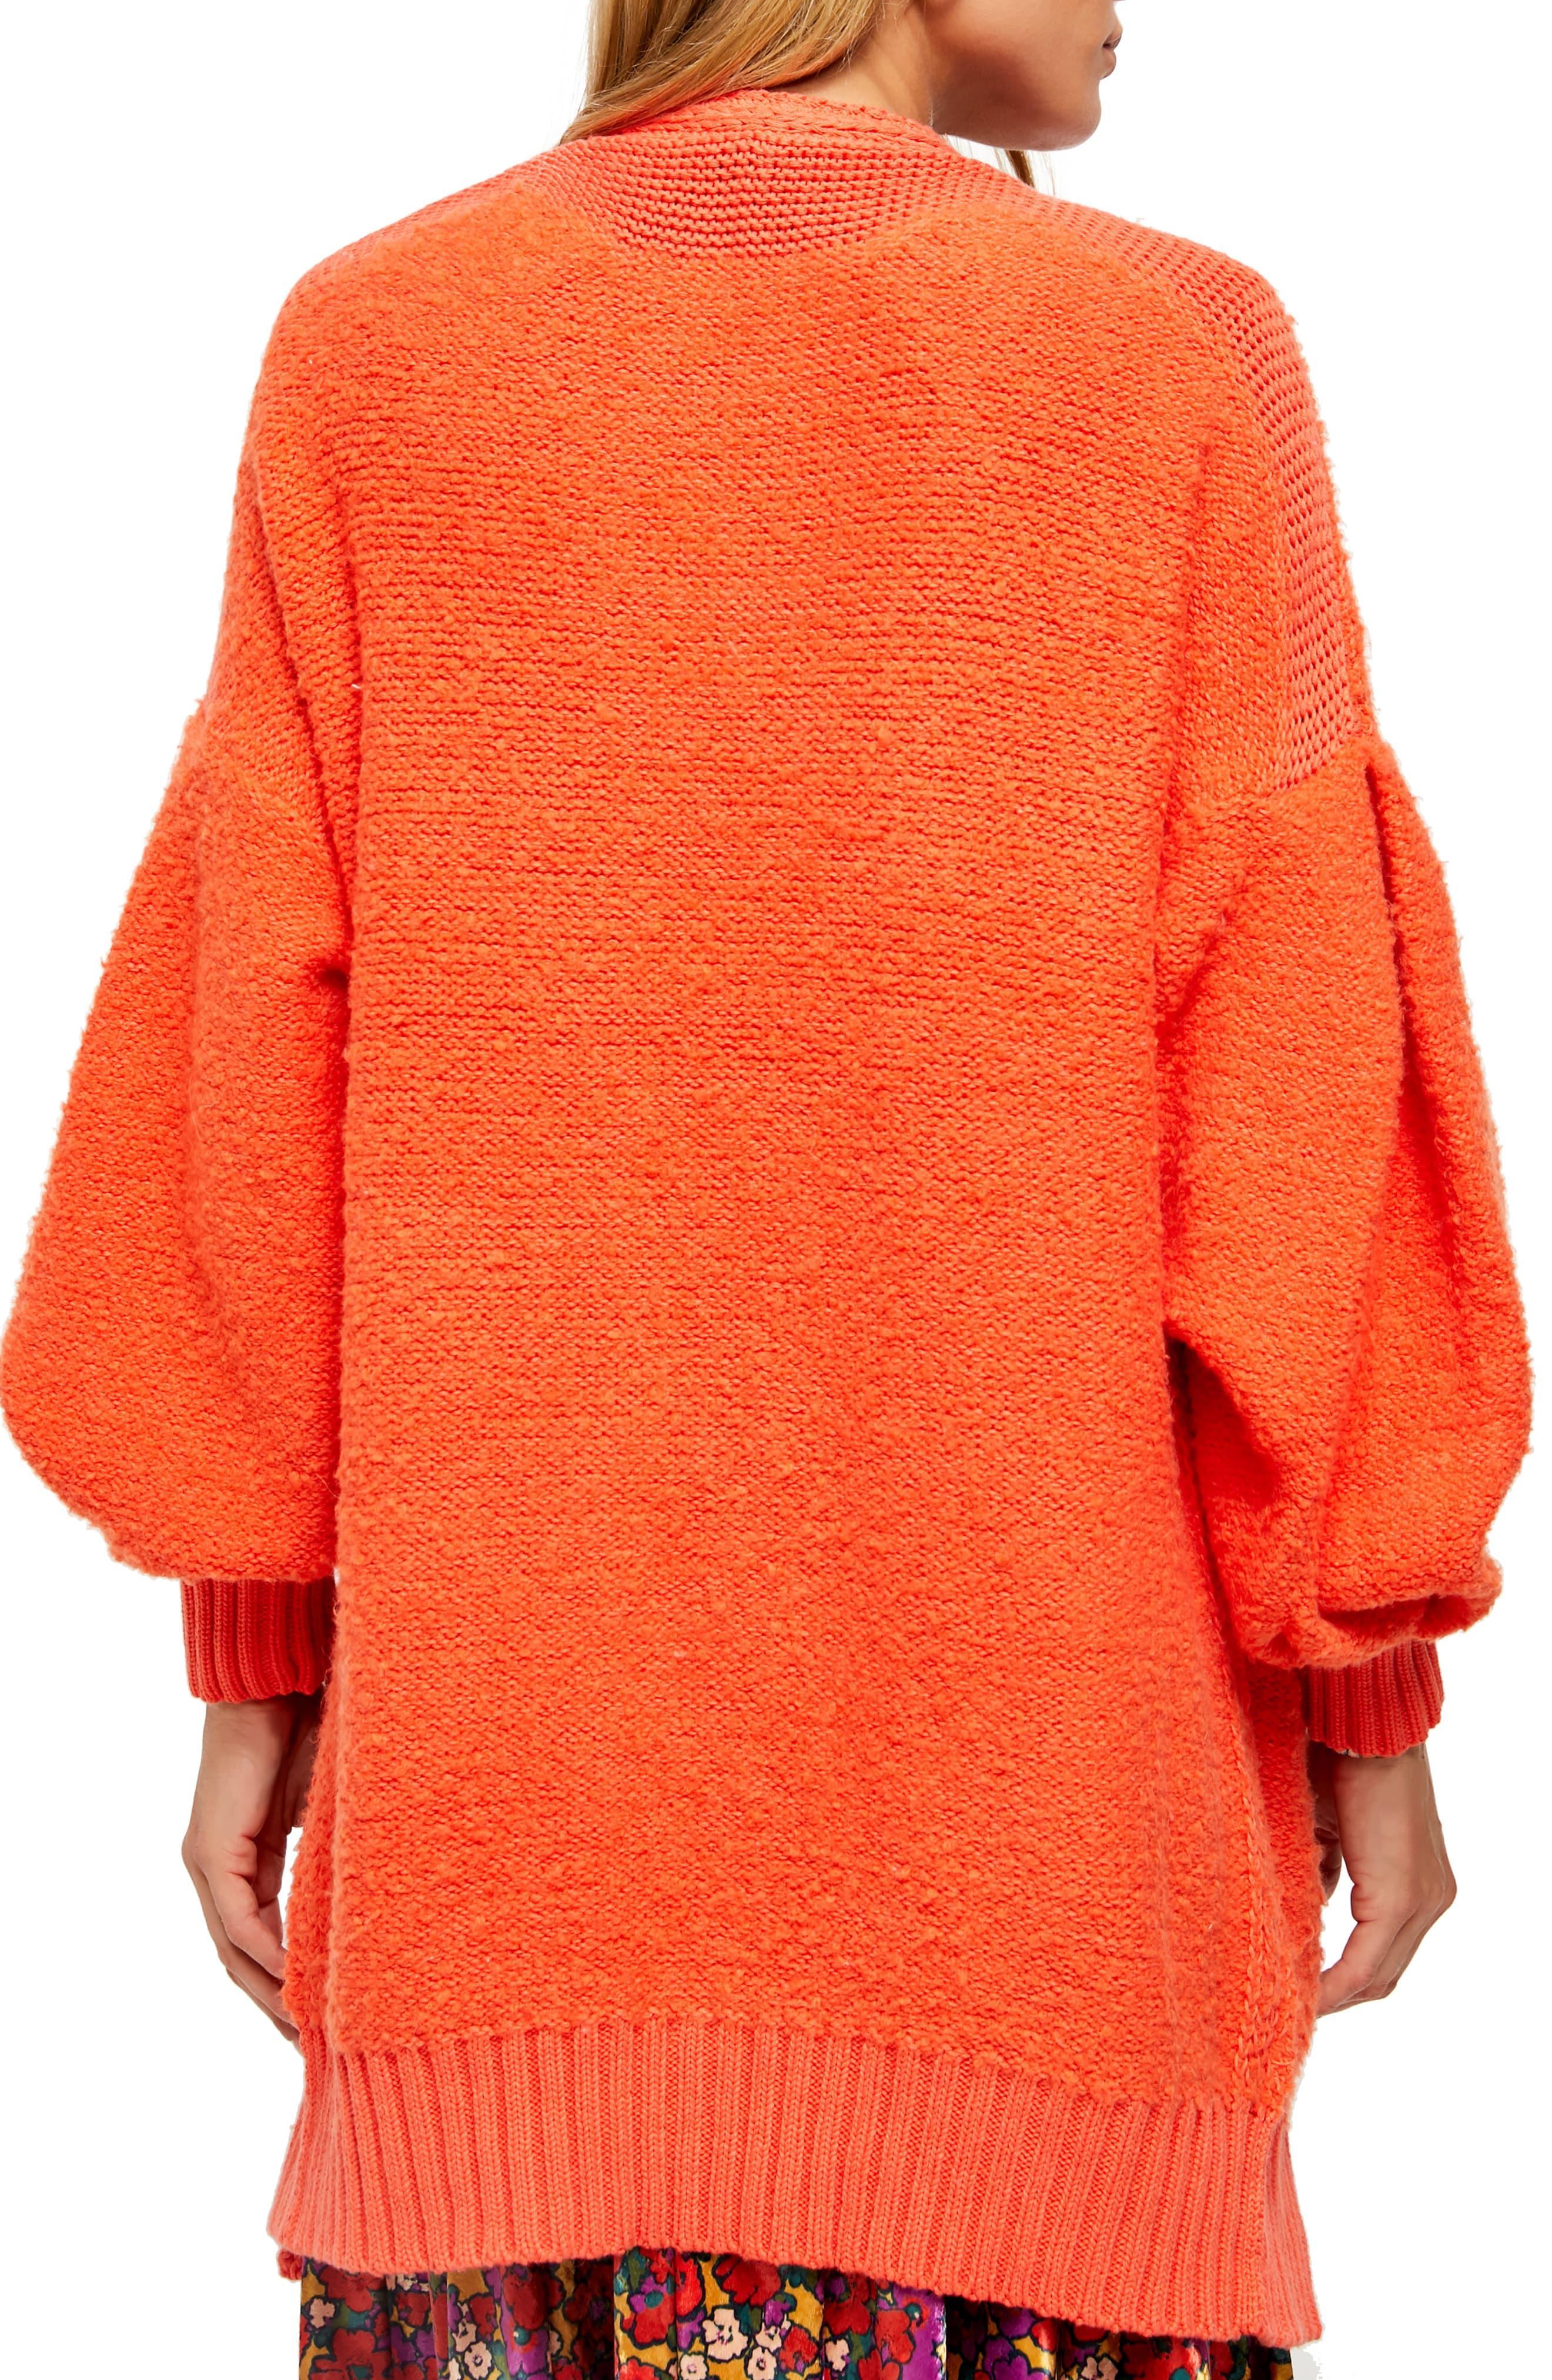 Free People Sweater Black Phantom Long Open Front Cardigan Wool Sz S NEW NWT